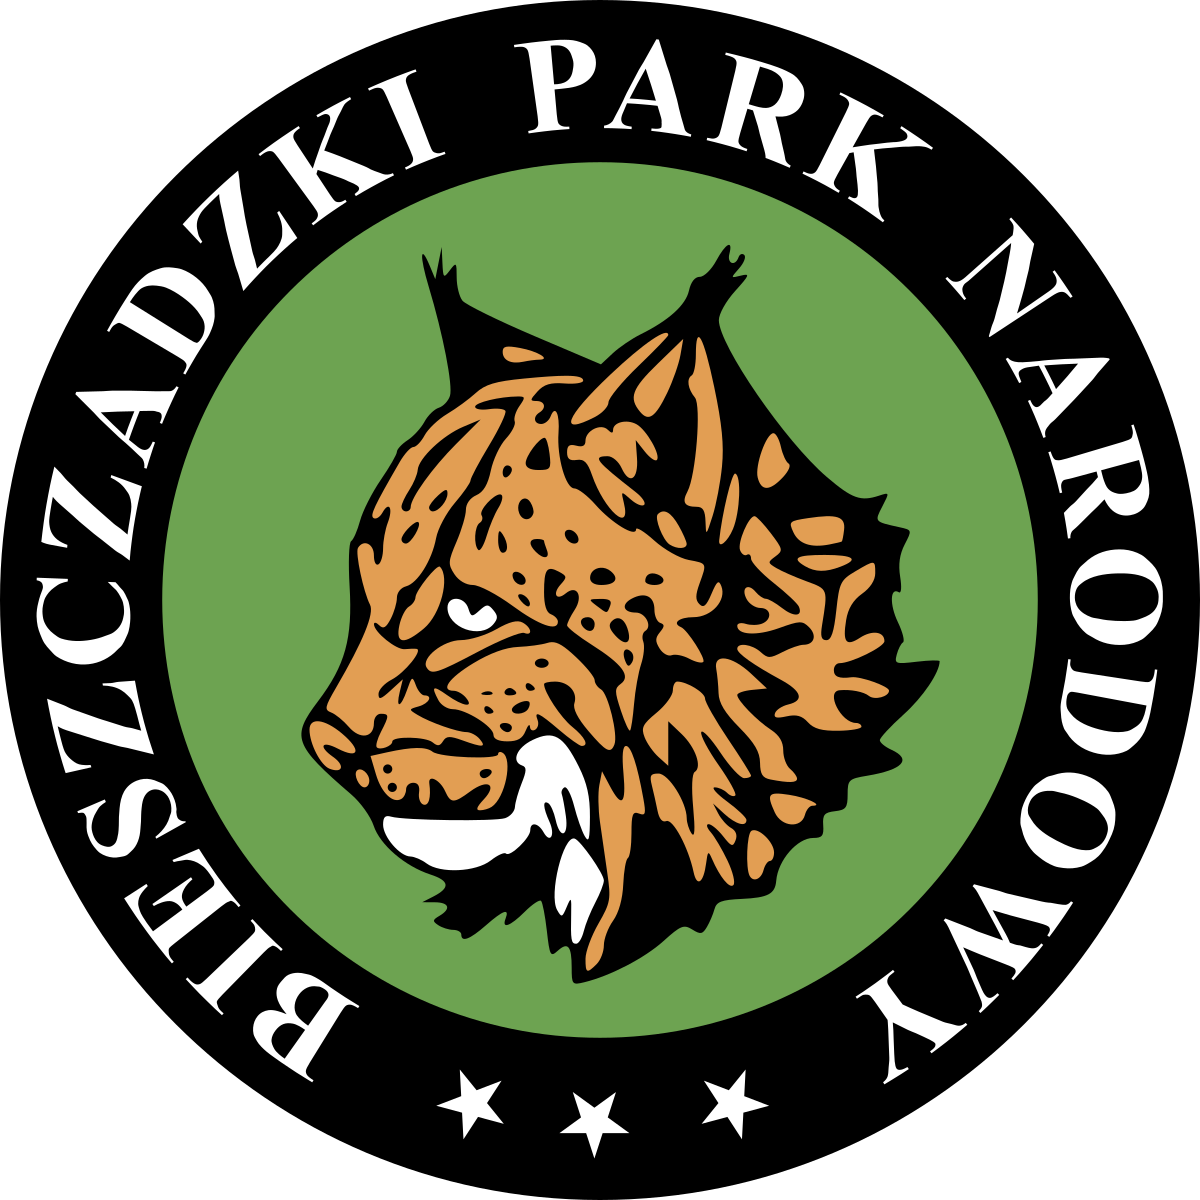 Bieszczady national wikipedia . Clipart park parc